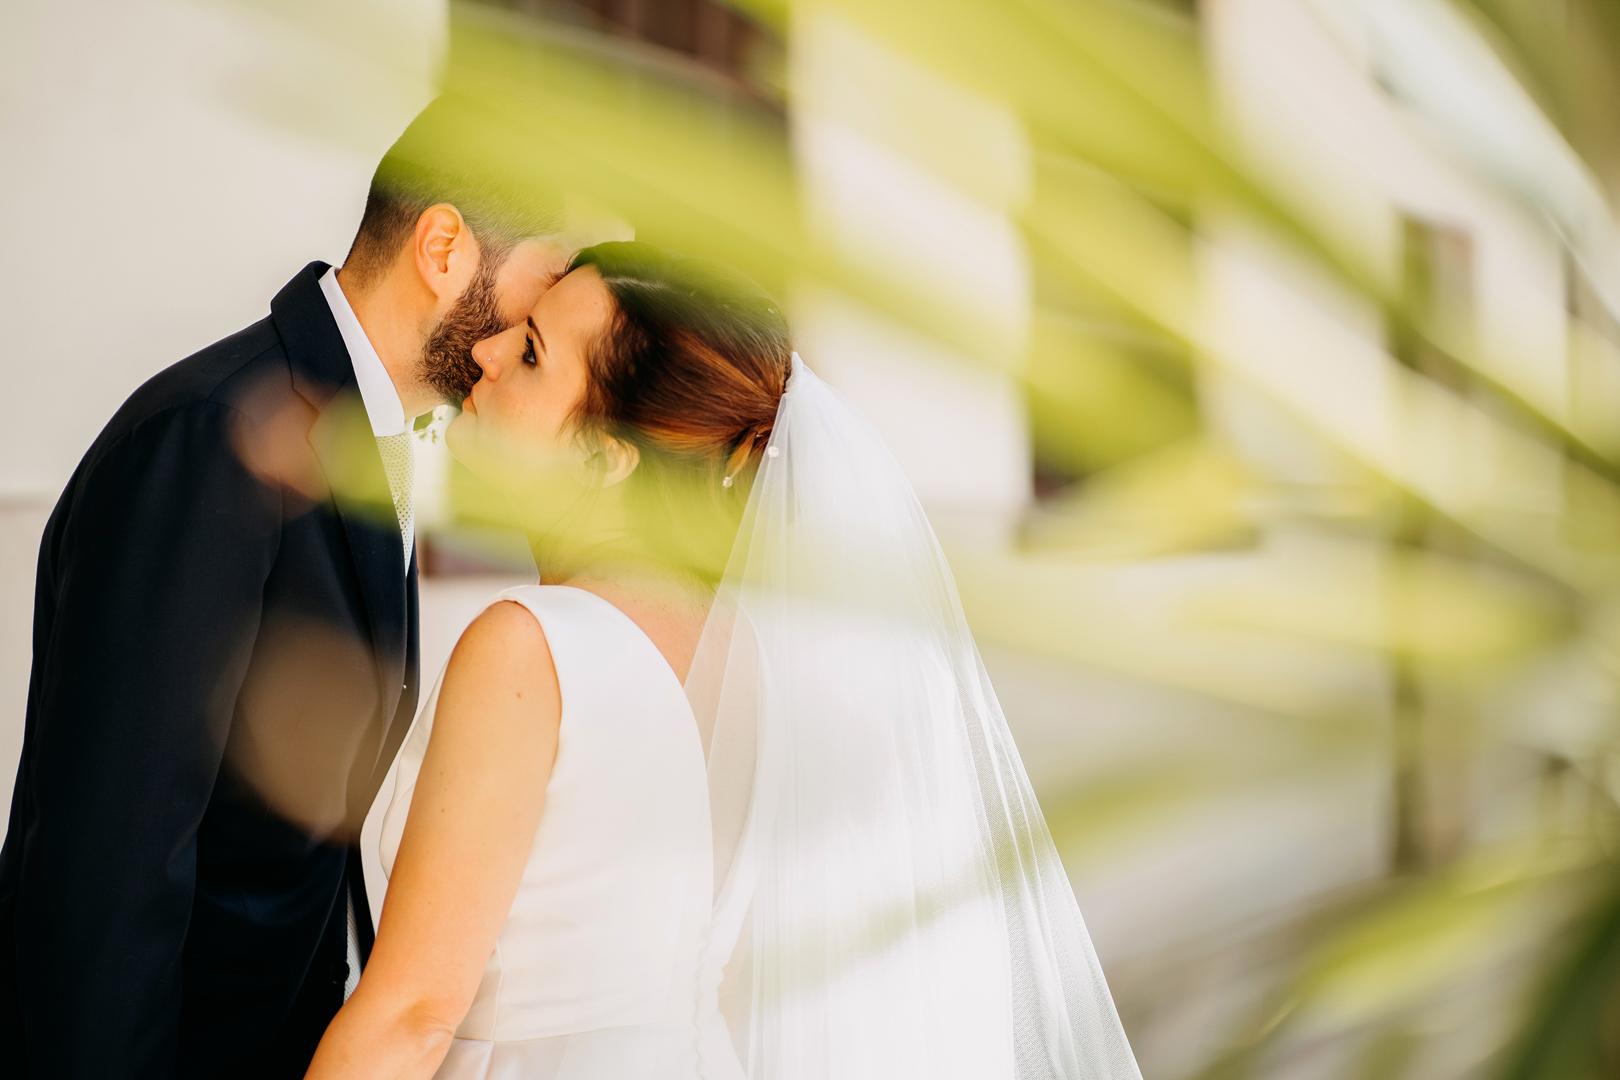 40 gianni-lepore-matrimonio-foggia-provincia